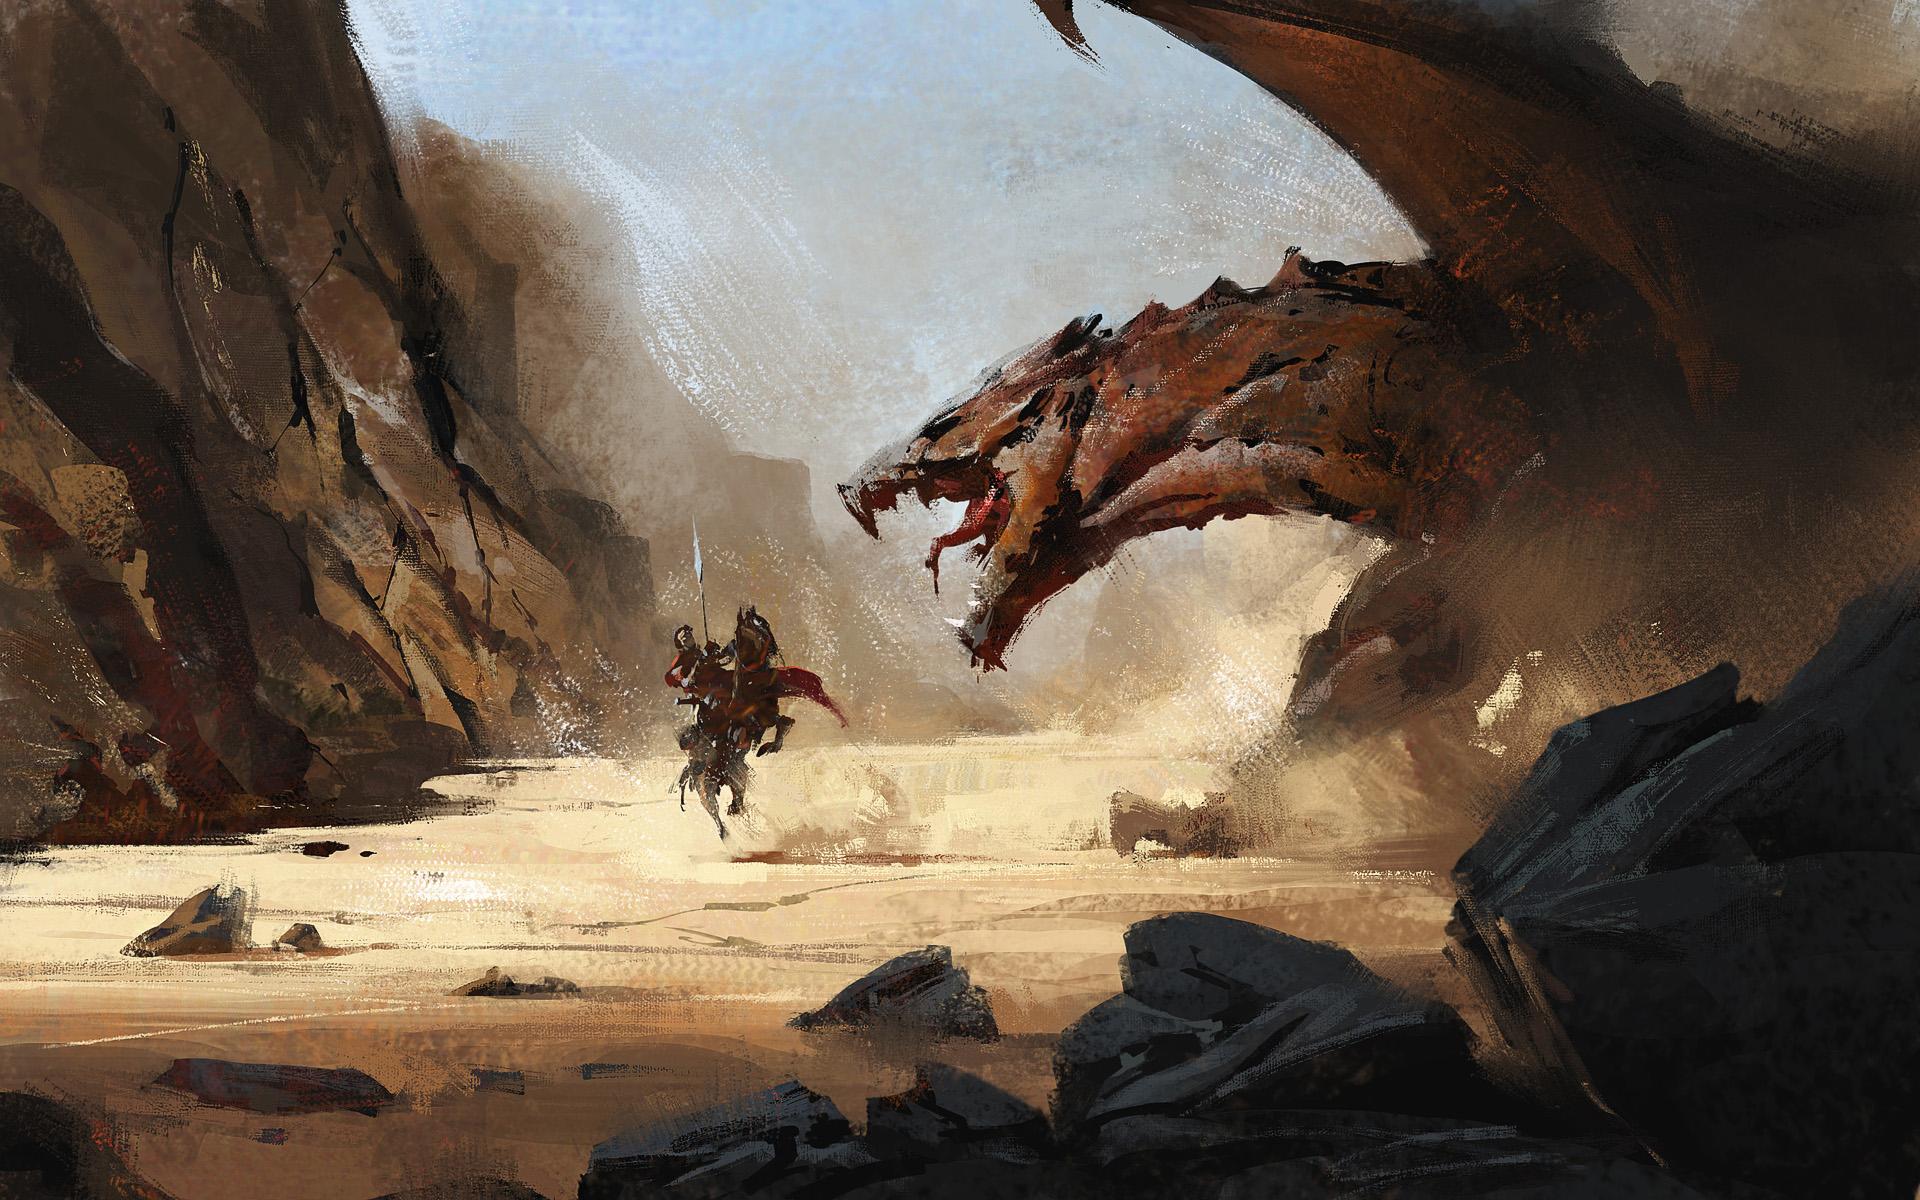 BESTIAIRE DE GUADALKEFUK - Page 4 Desert_dragon___gumroad_video_by_88grzes-db53u11